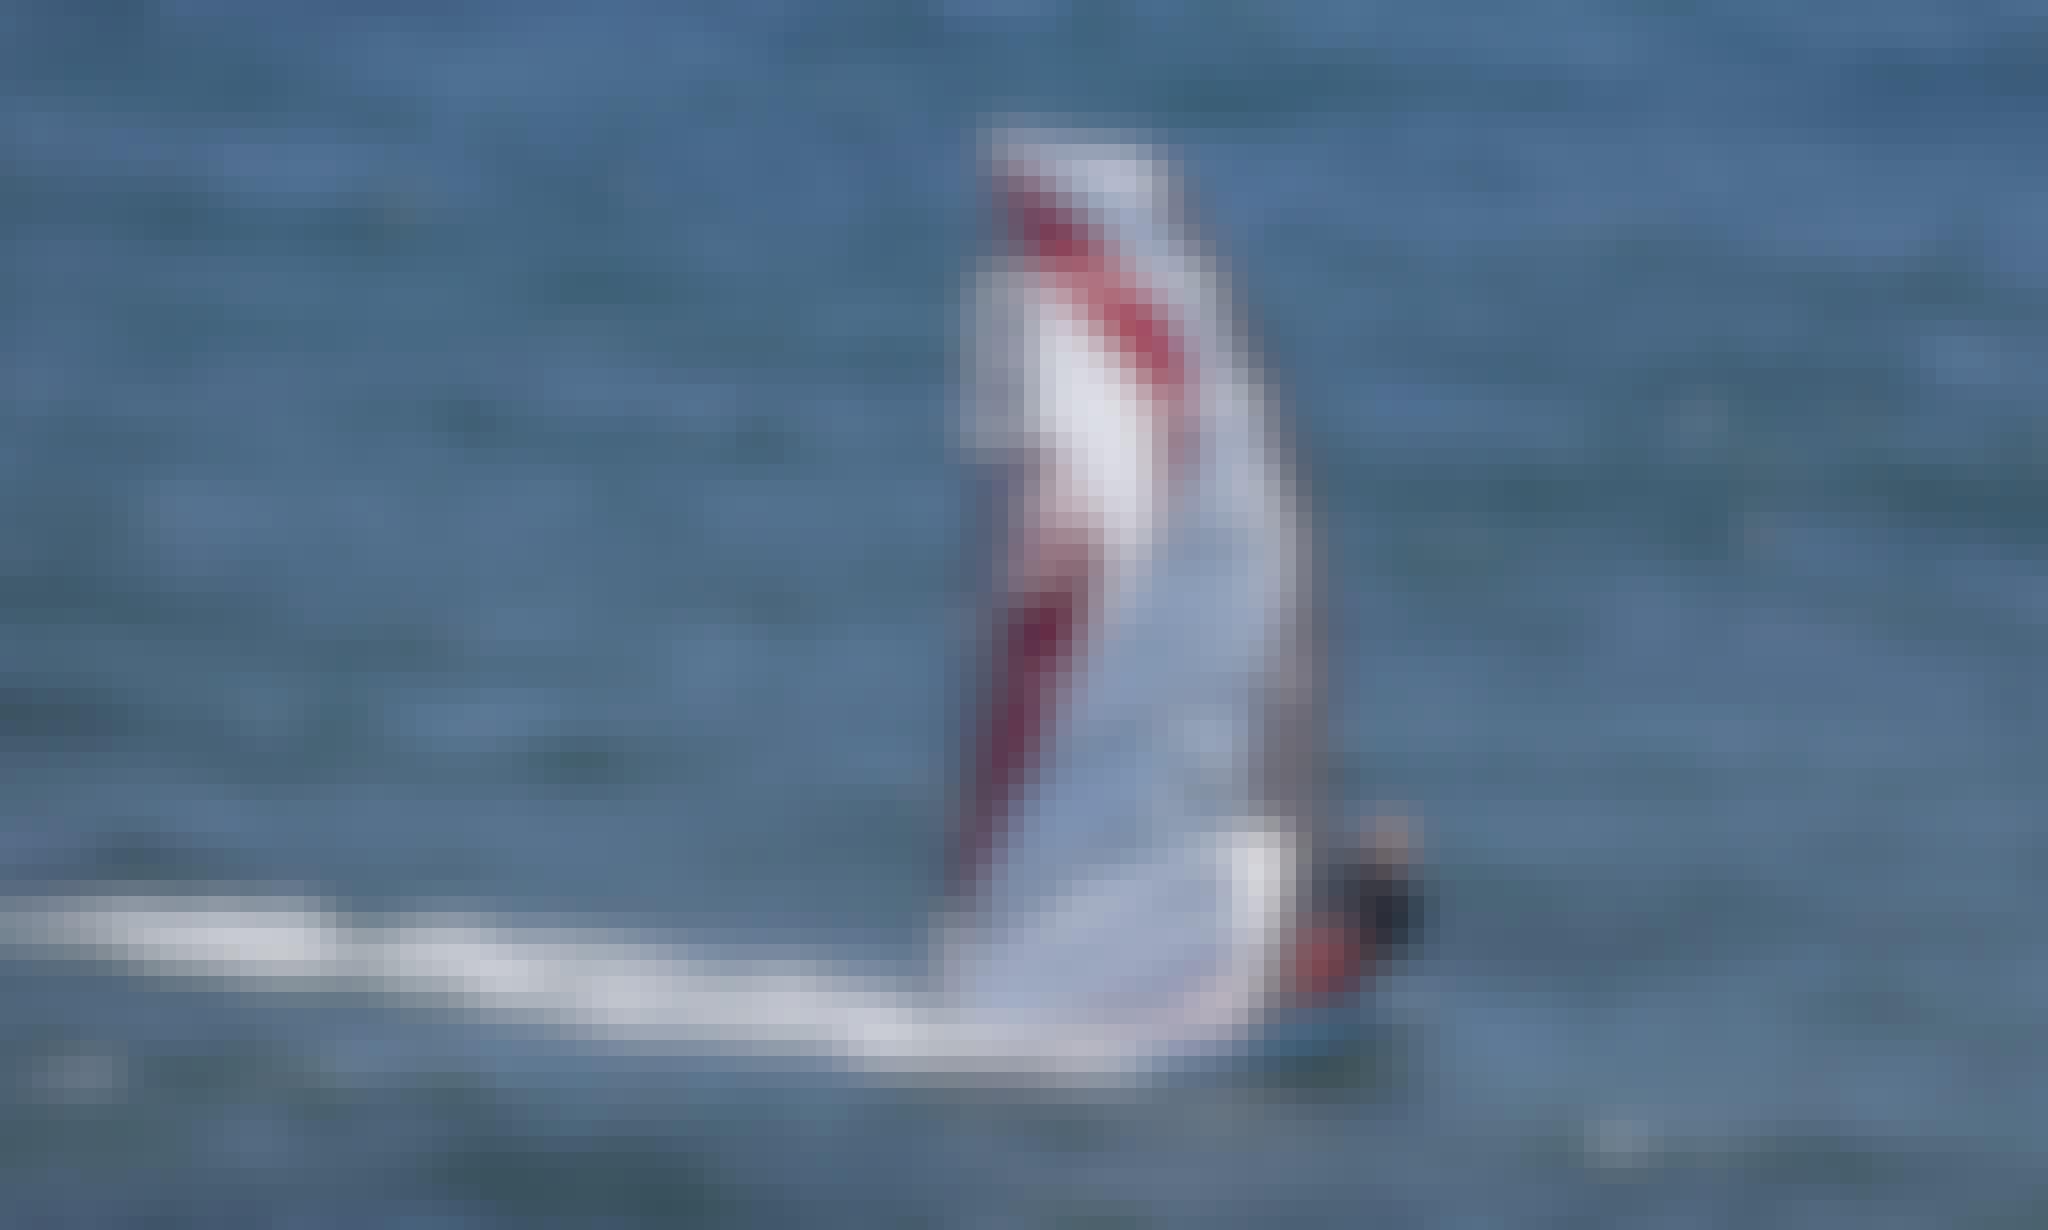 Windsurfing Courses and Rental in Kentrikos Tomeas Athinon, Greece